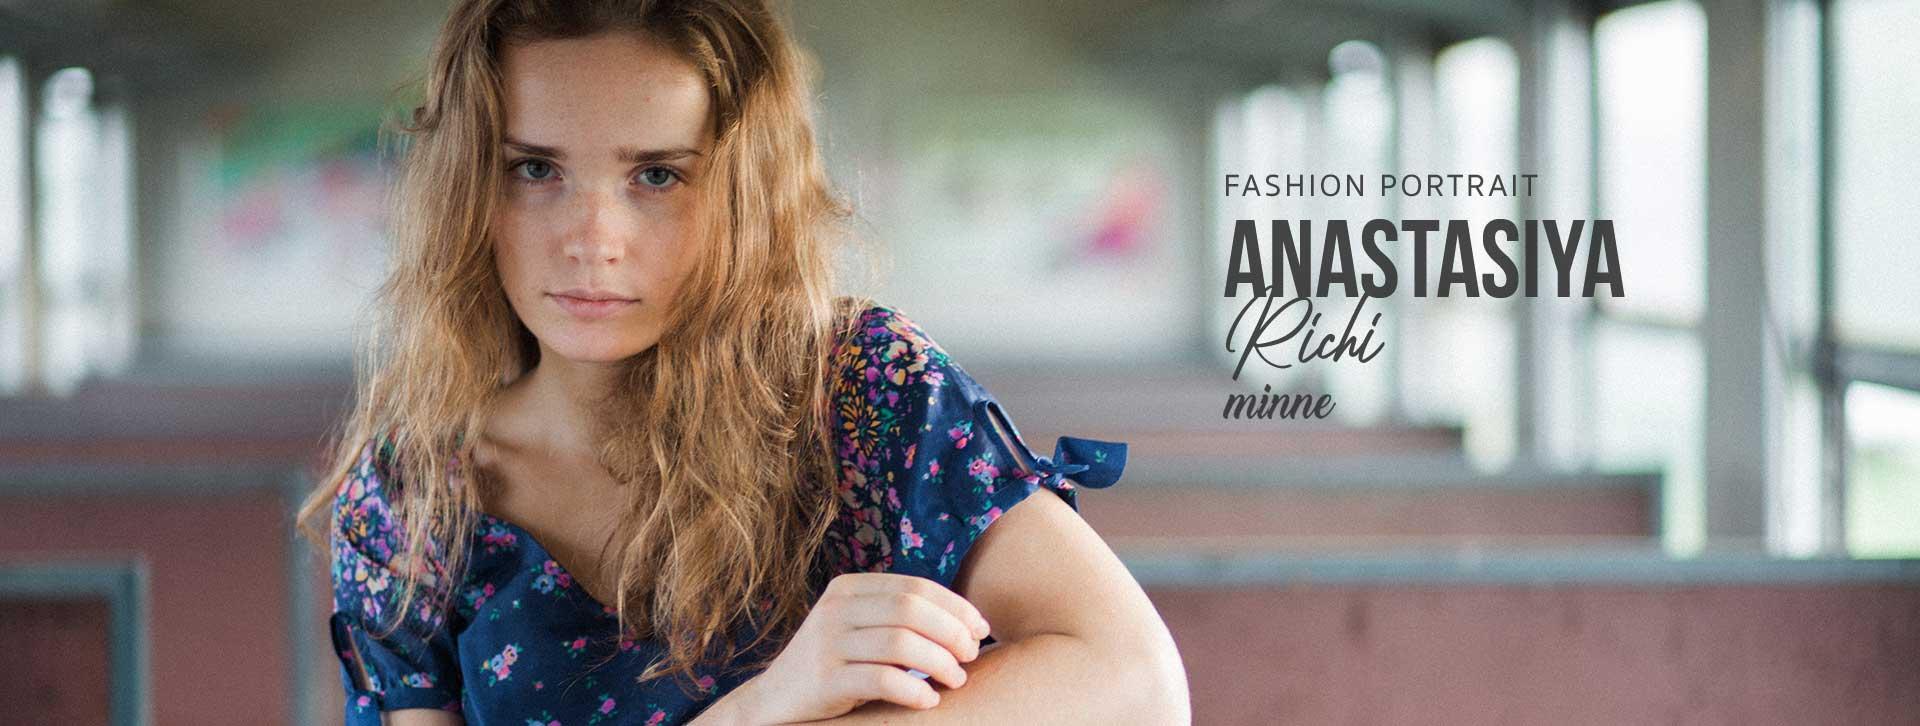 bangkok thailand mood fashion portrait anastasiya richi long cover